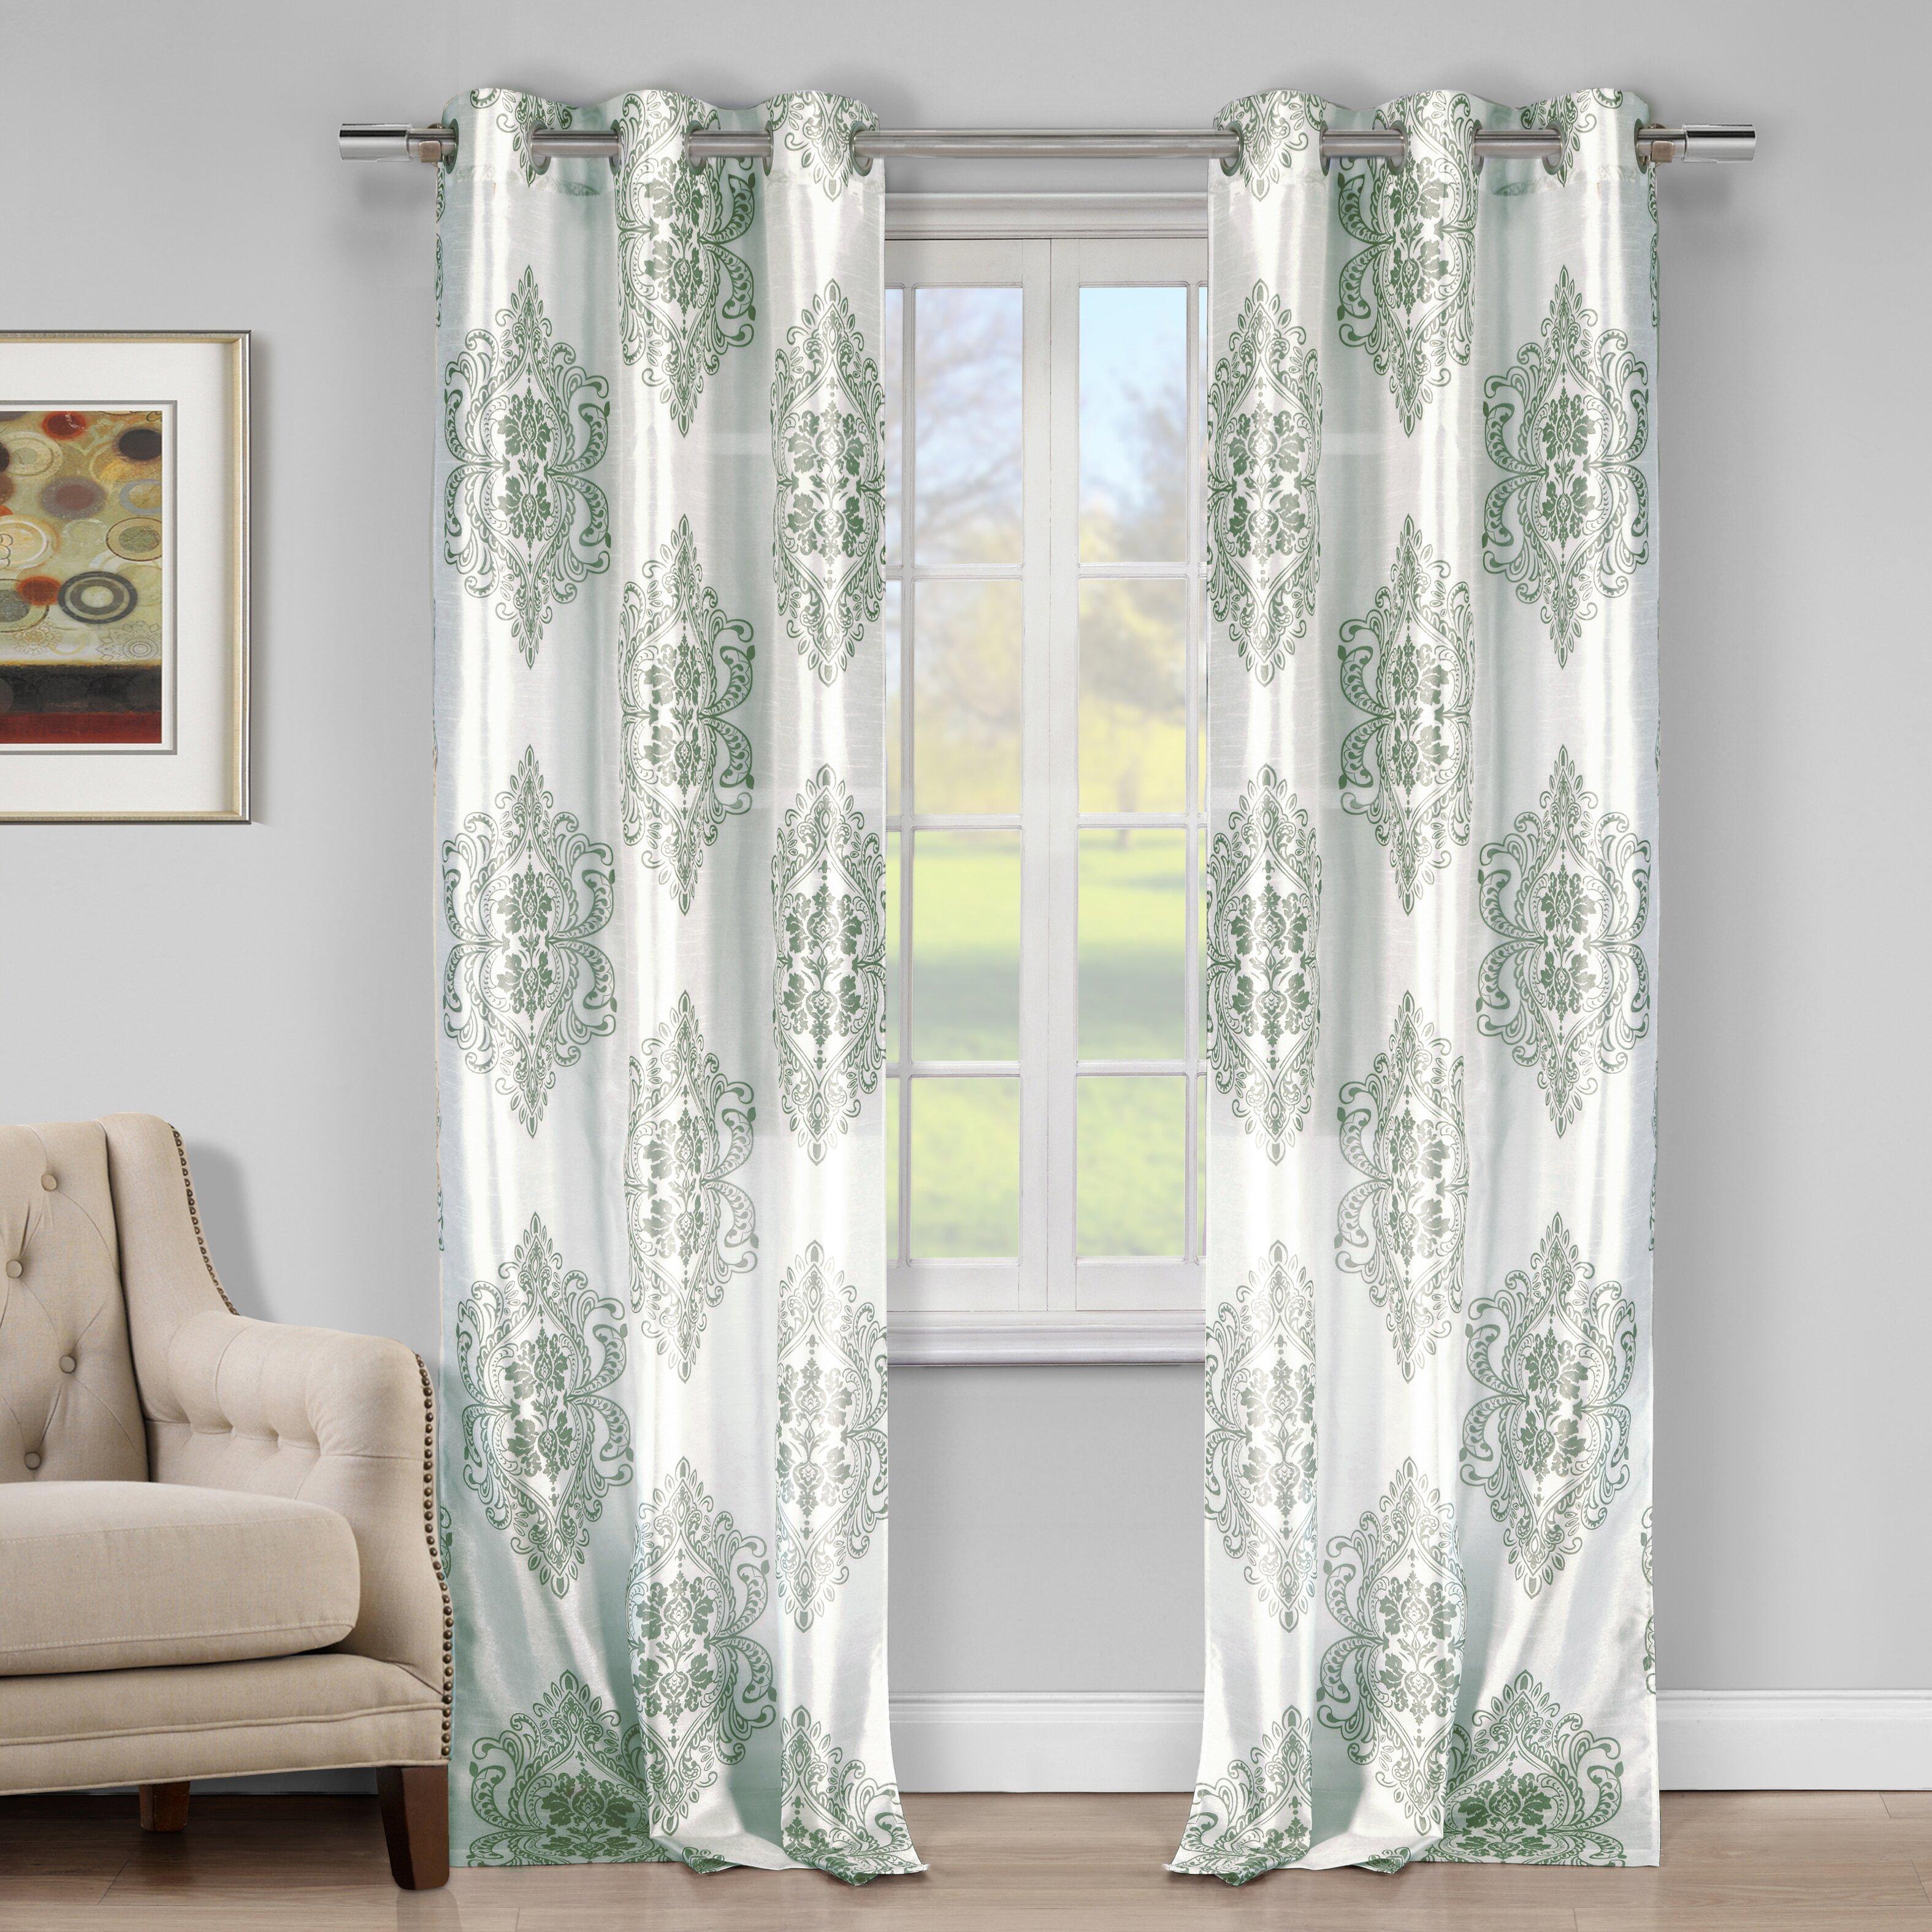 Dr International Bellissimo Faux Silk Grommet Curtain Panels Reviews Wayfair